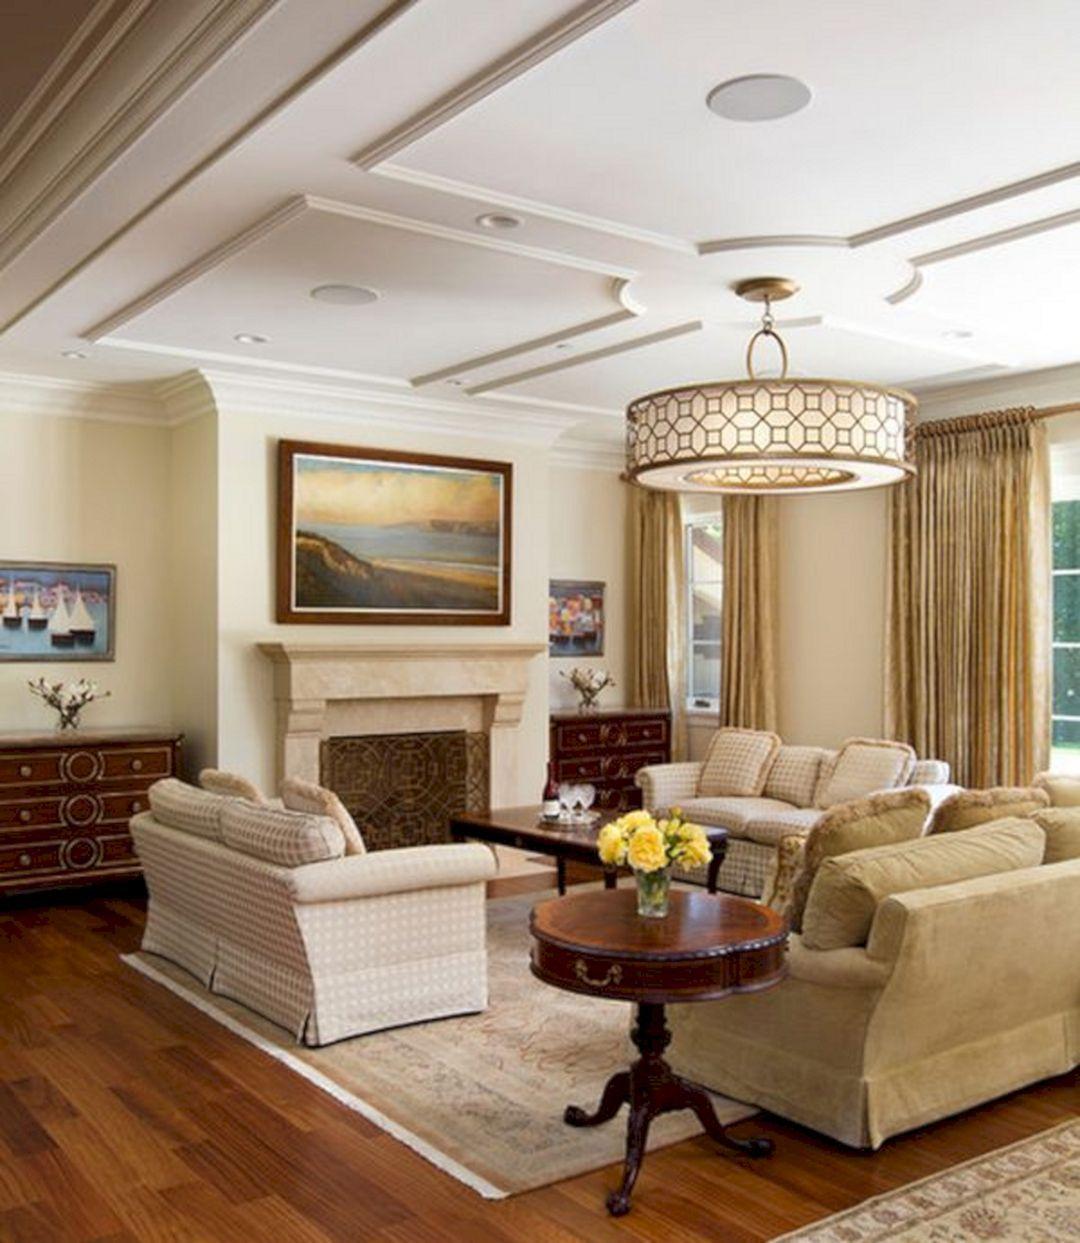 20 Romantic Light Fixture For Beautiful Living Room Ideas